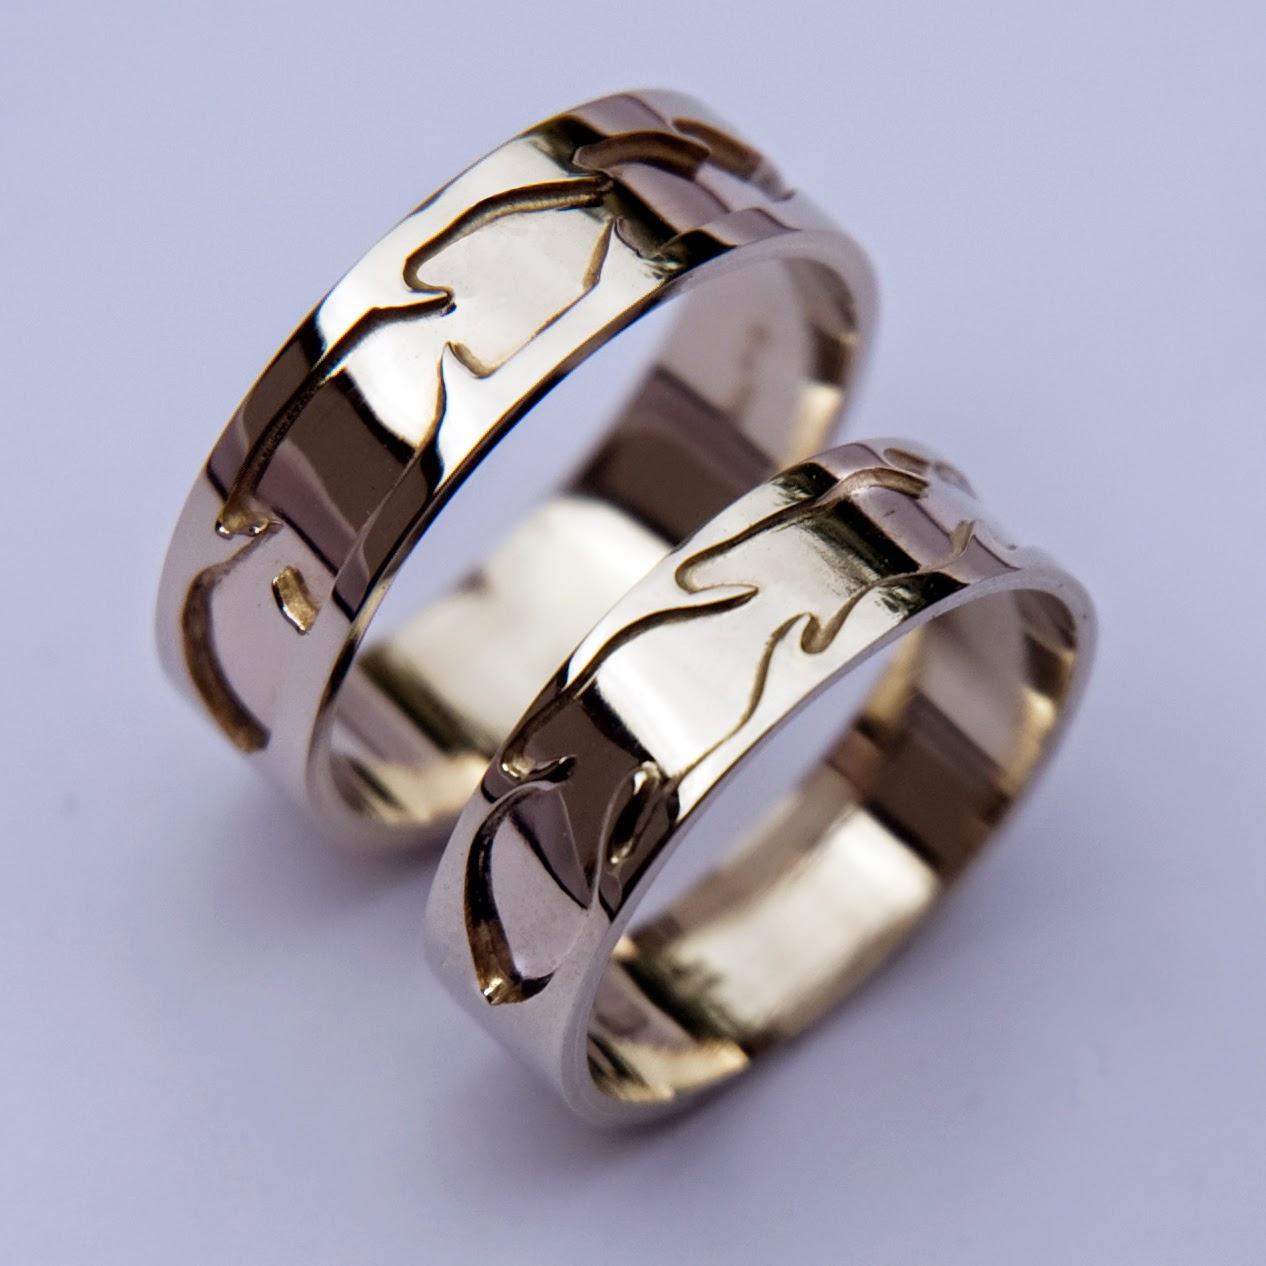 Zhaawanart Fisher Star Creations Wedding Rings Design: Native American Wedding Ring Designs At Websimilar.org